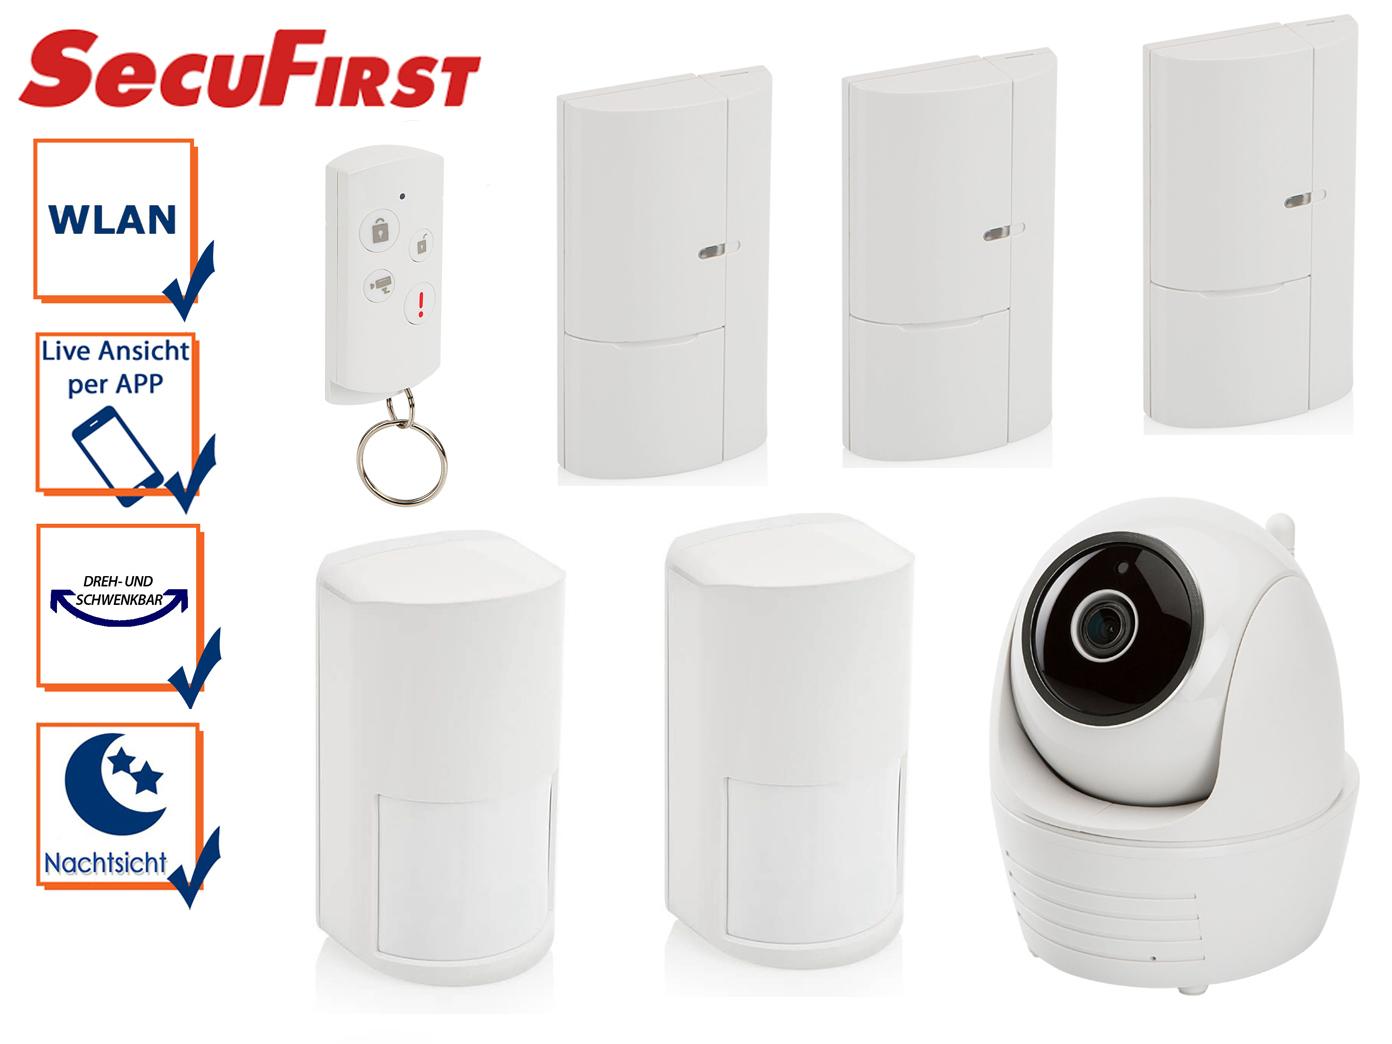 Alarmsystem mit IP Kamera, Magnetkontakten, Bewegungsmelder, Smartphone App